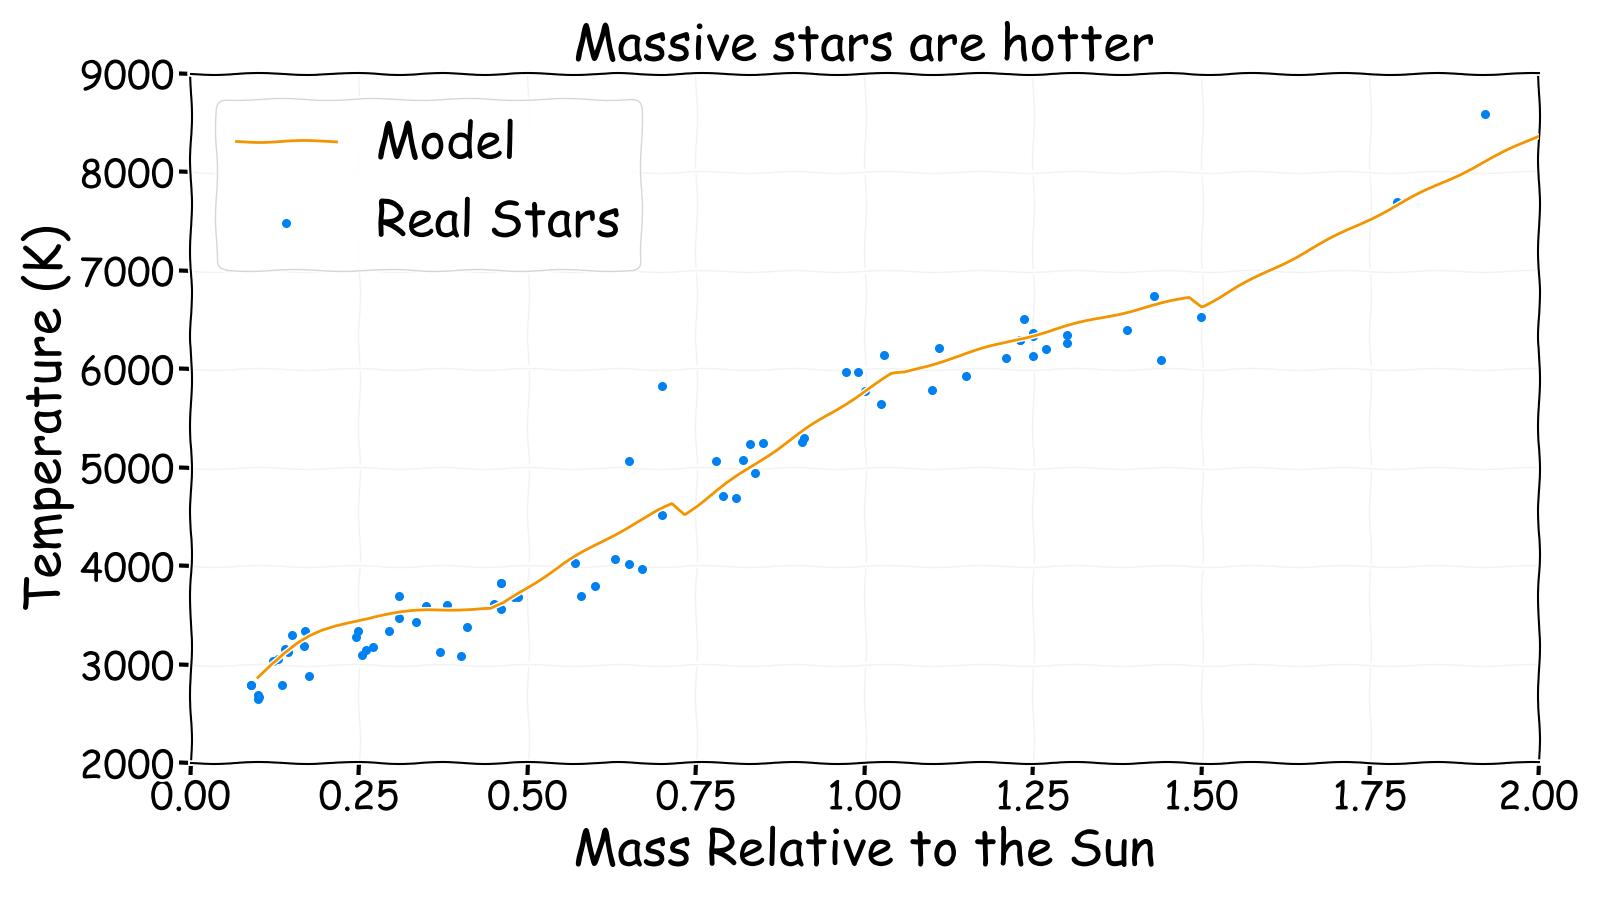 Massive stars are hotter